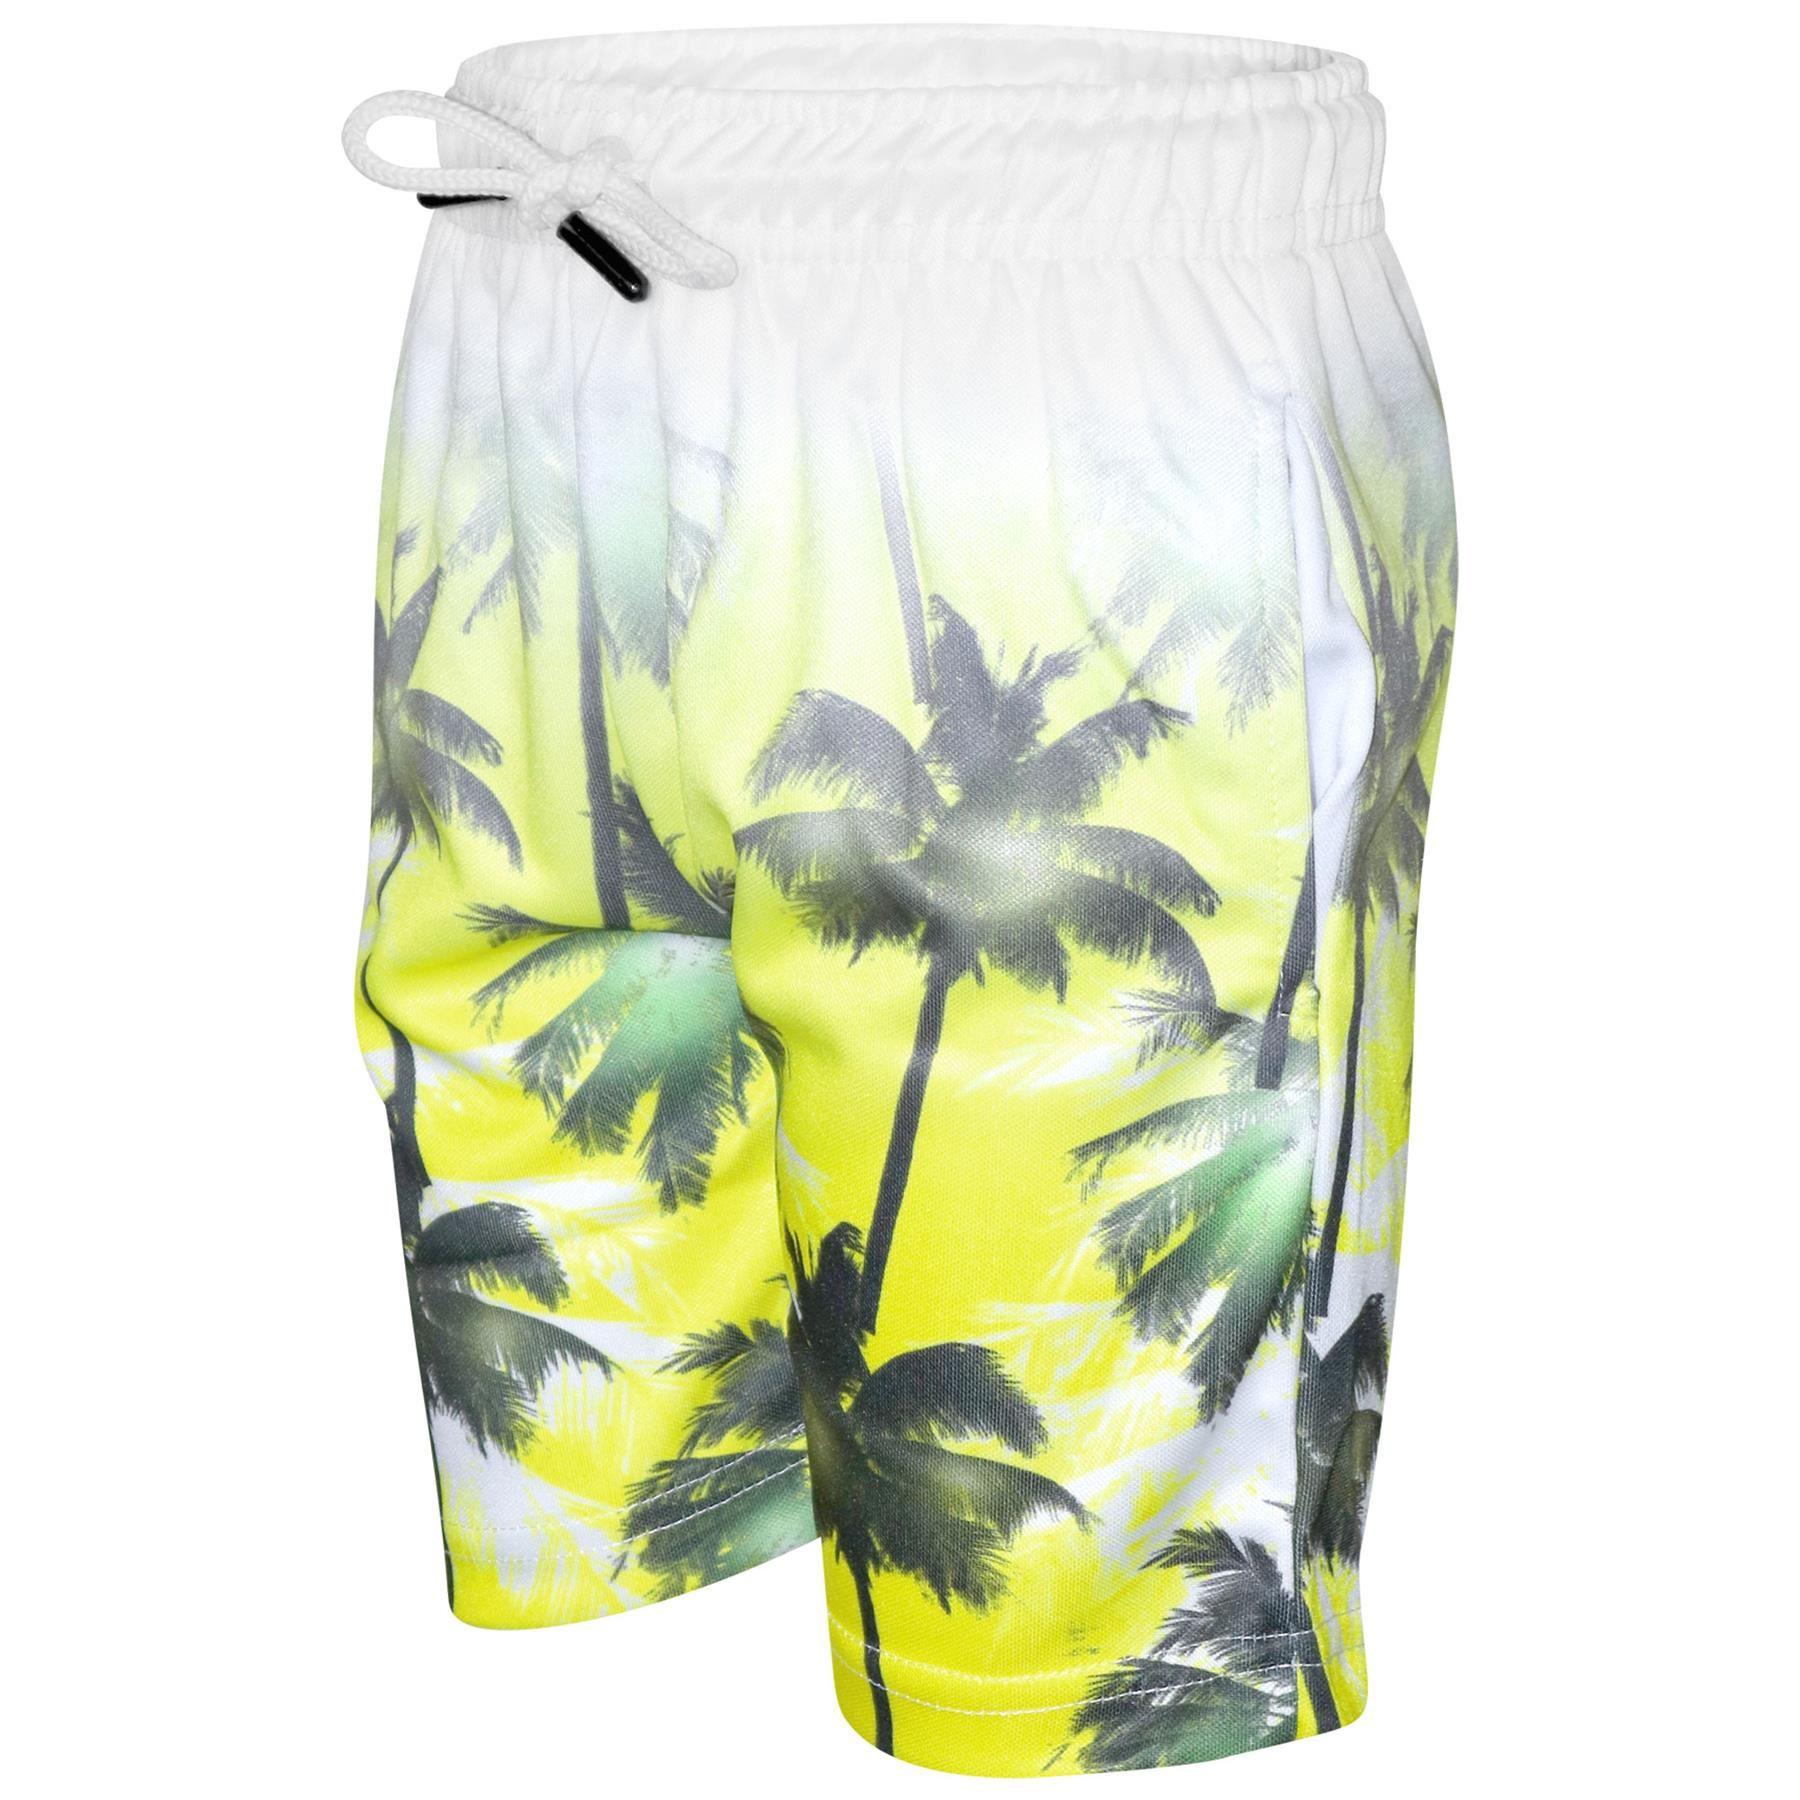 Niño Camiseta Pantalones Cortos Palmeras Desteñir Dos Tonos Amarillo Verano Sets